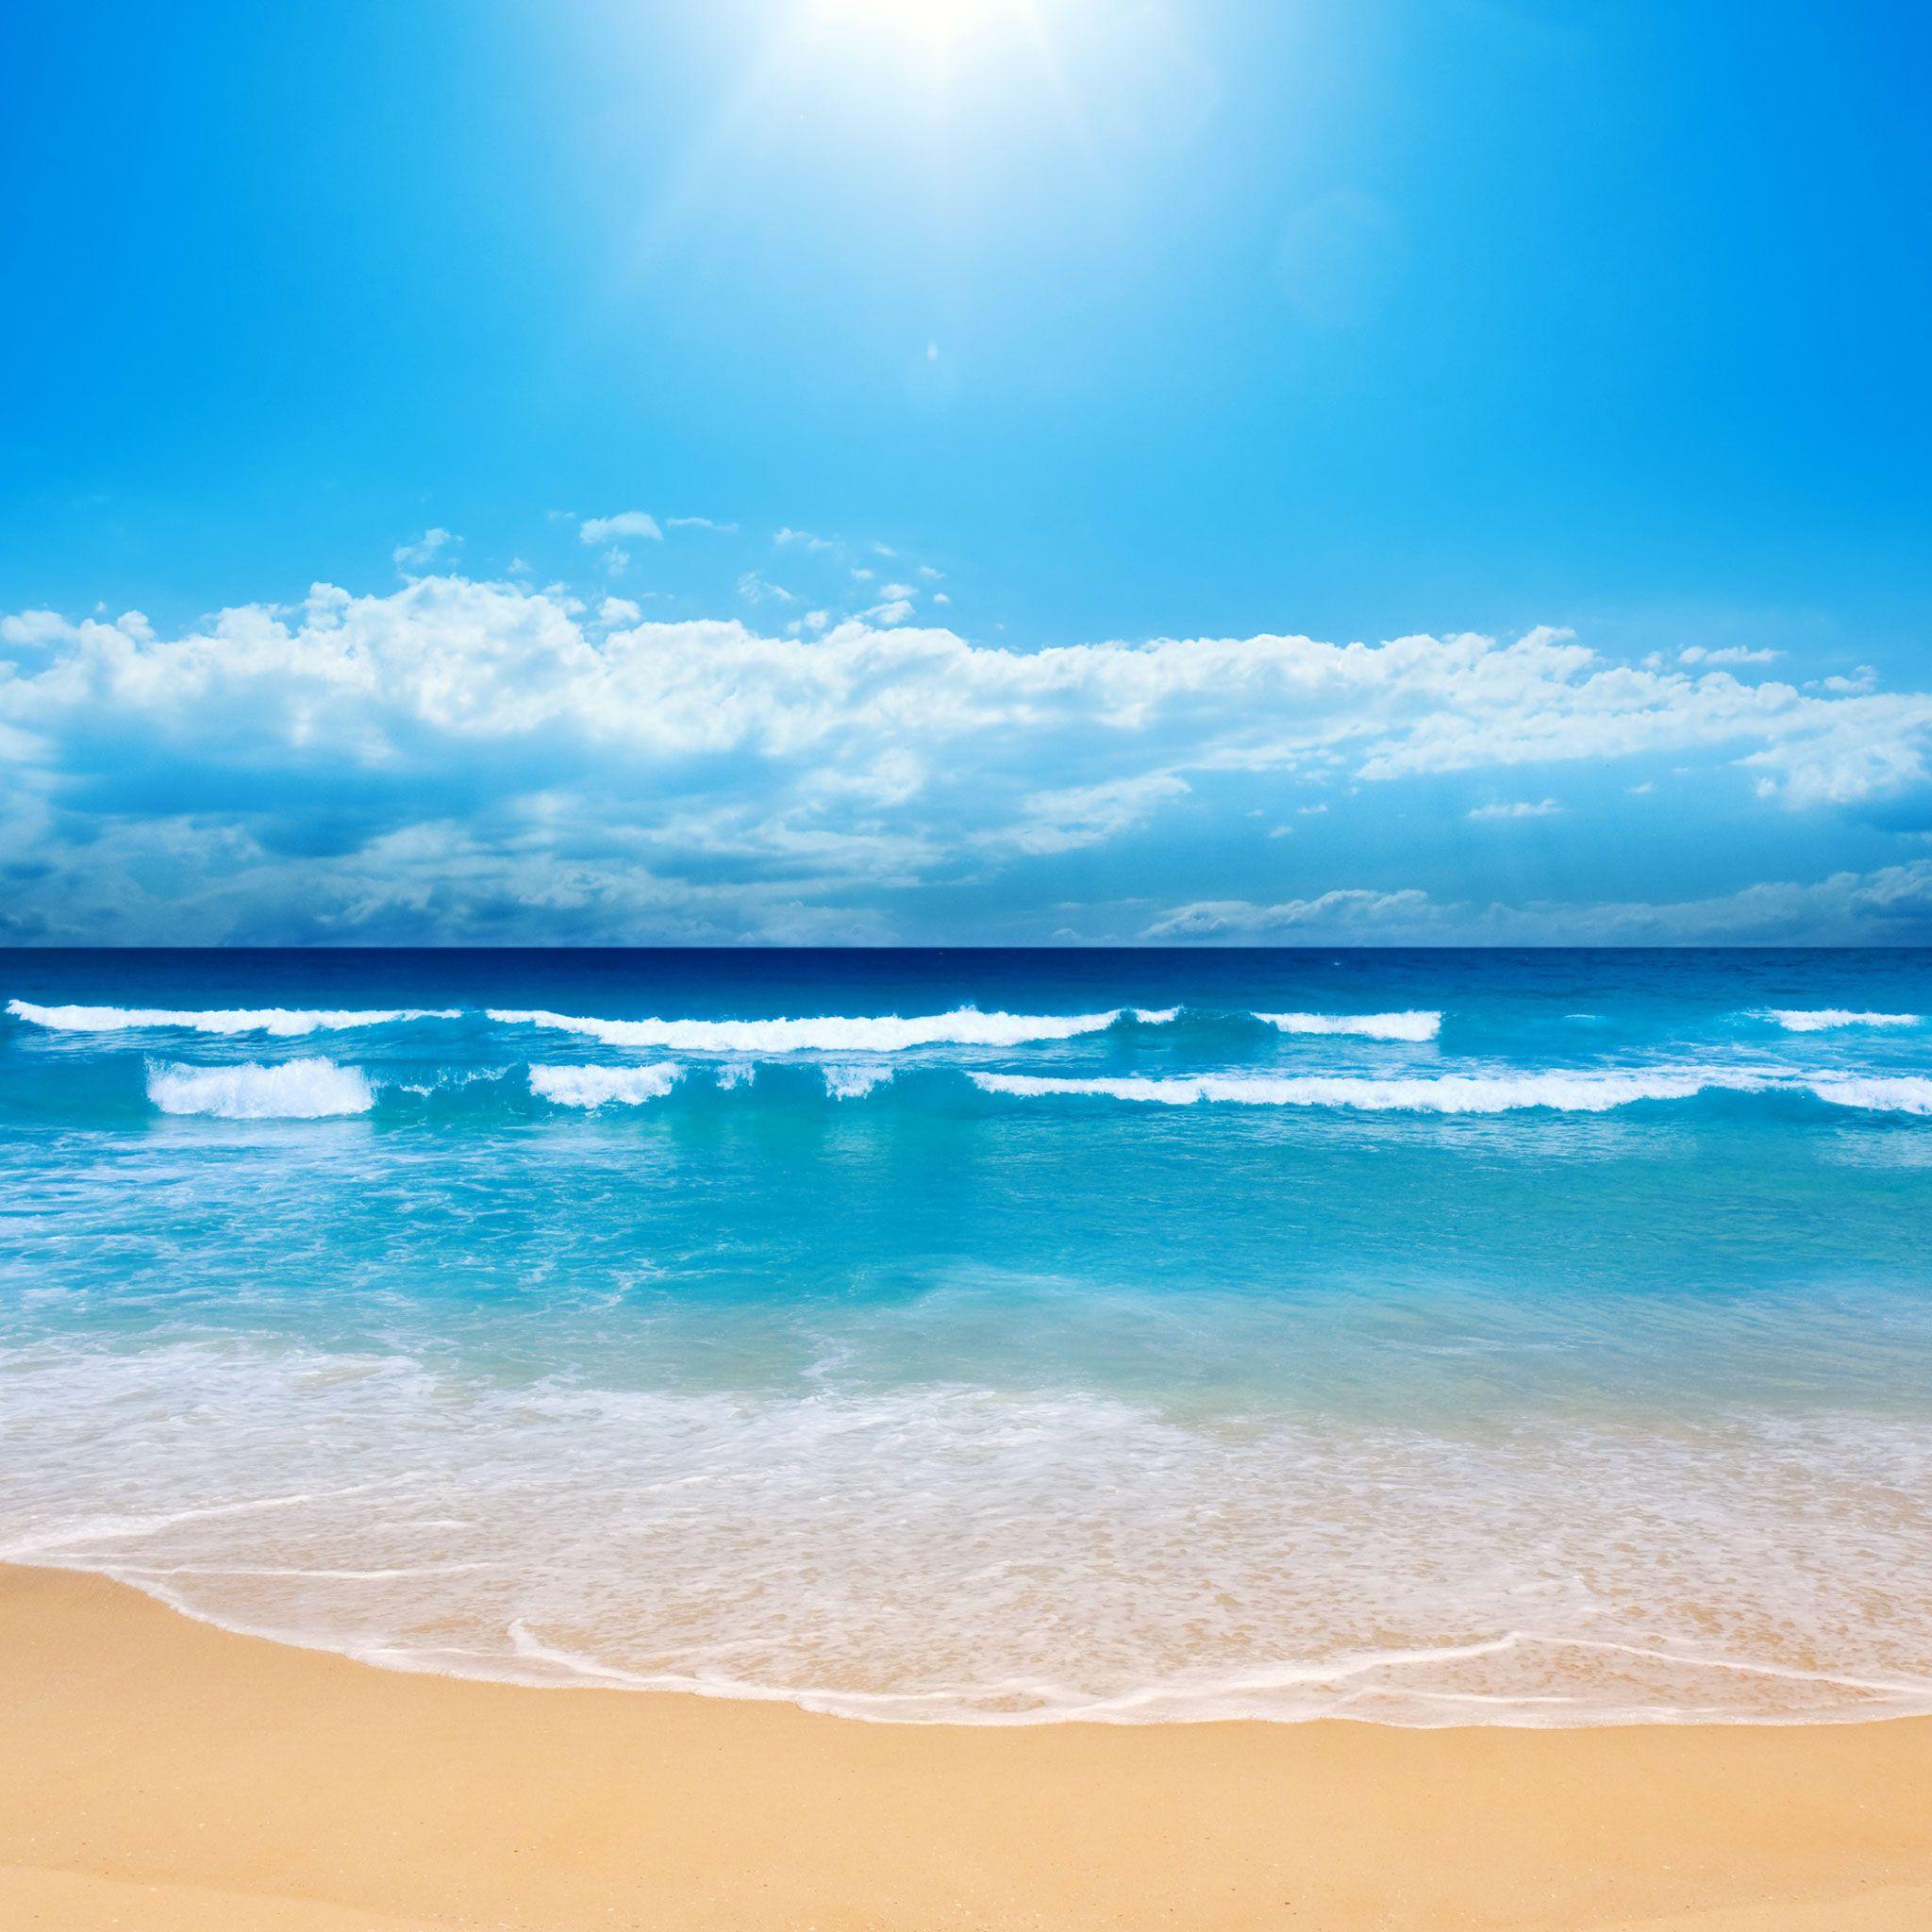 iPad Retina Wallpapers HD - Retina ready, stunning wallpapers | Wallpapers | Pinterest | Beach ...